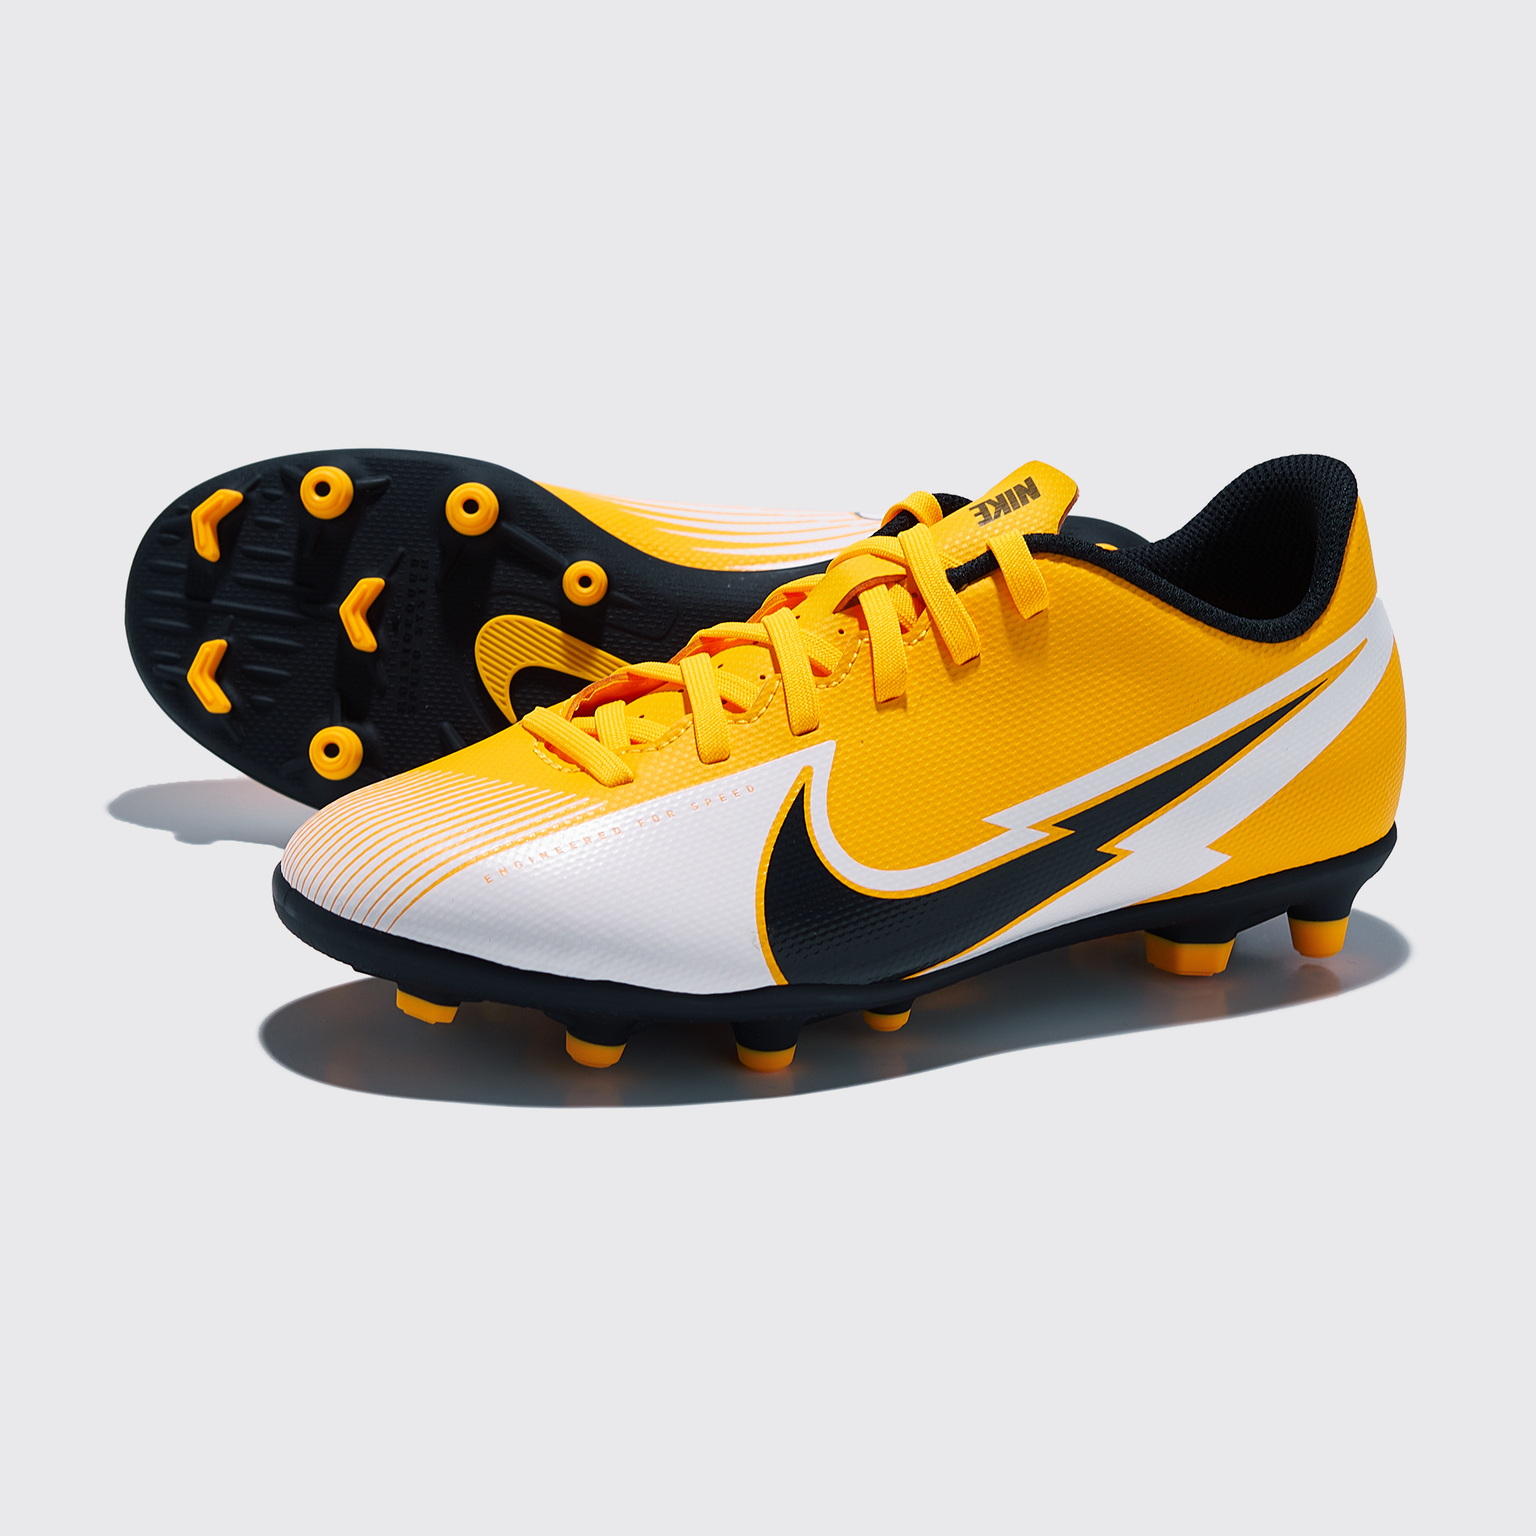 Бутсы детские Nike Vapor 13 Club FG/MG AT8161-801 бутсы детские nike vapor 13 club mg ps at8162 010